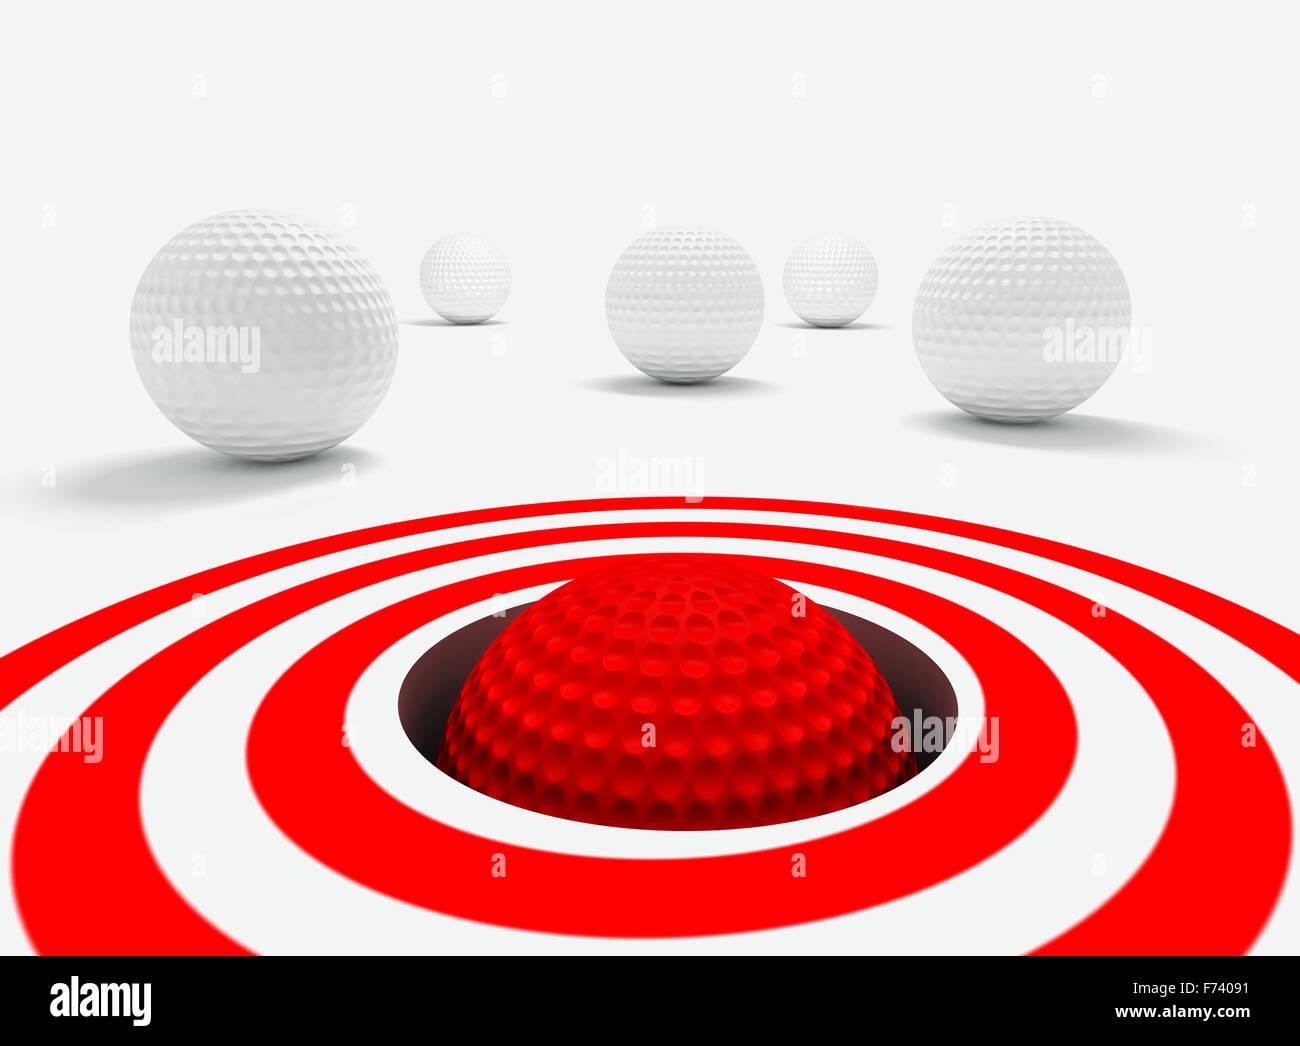 Imagen 3D Conceptual de éxito con las bolas de golf Imagen De Stock